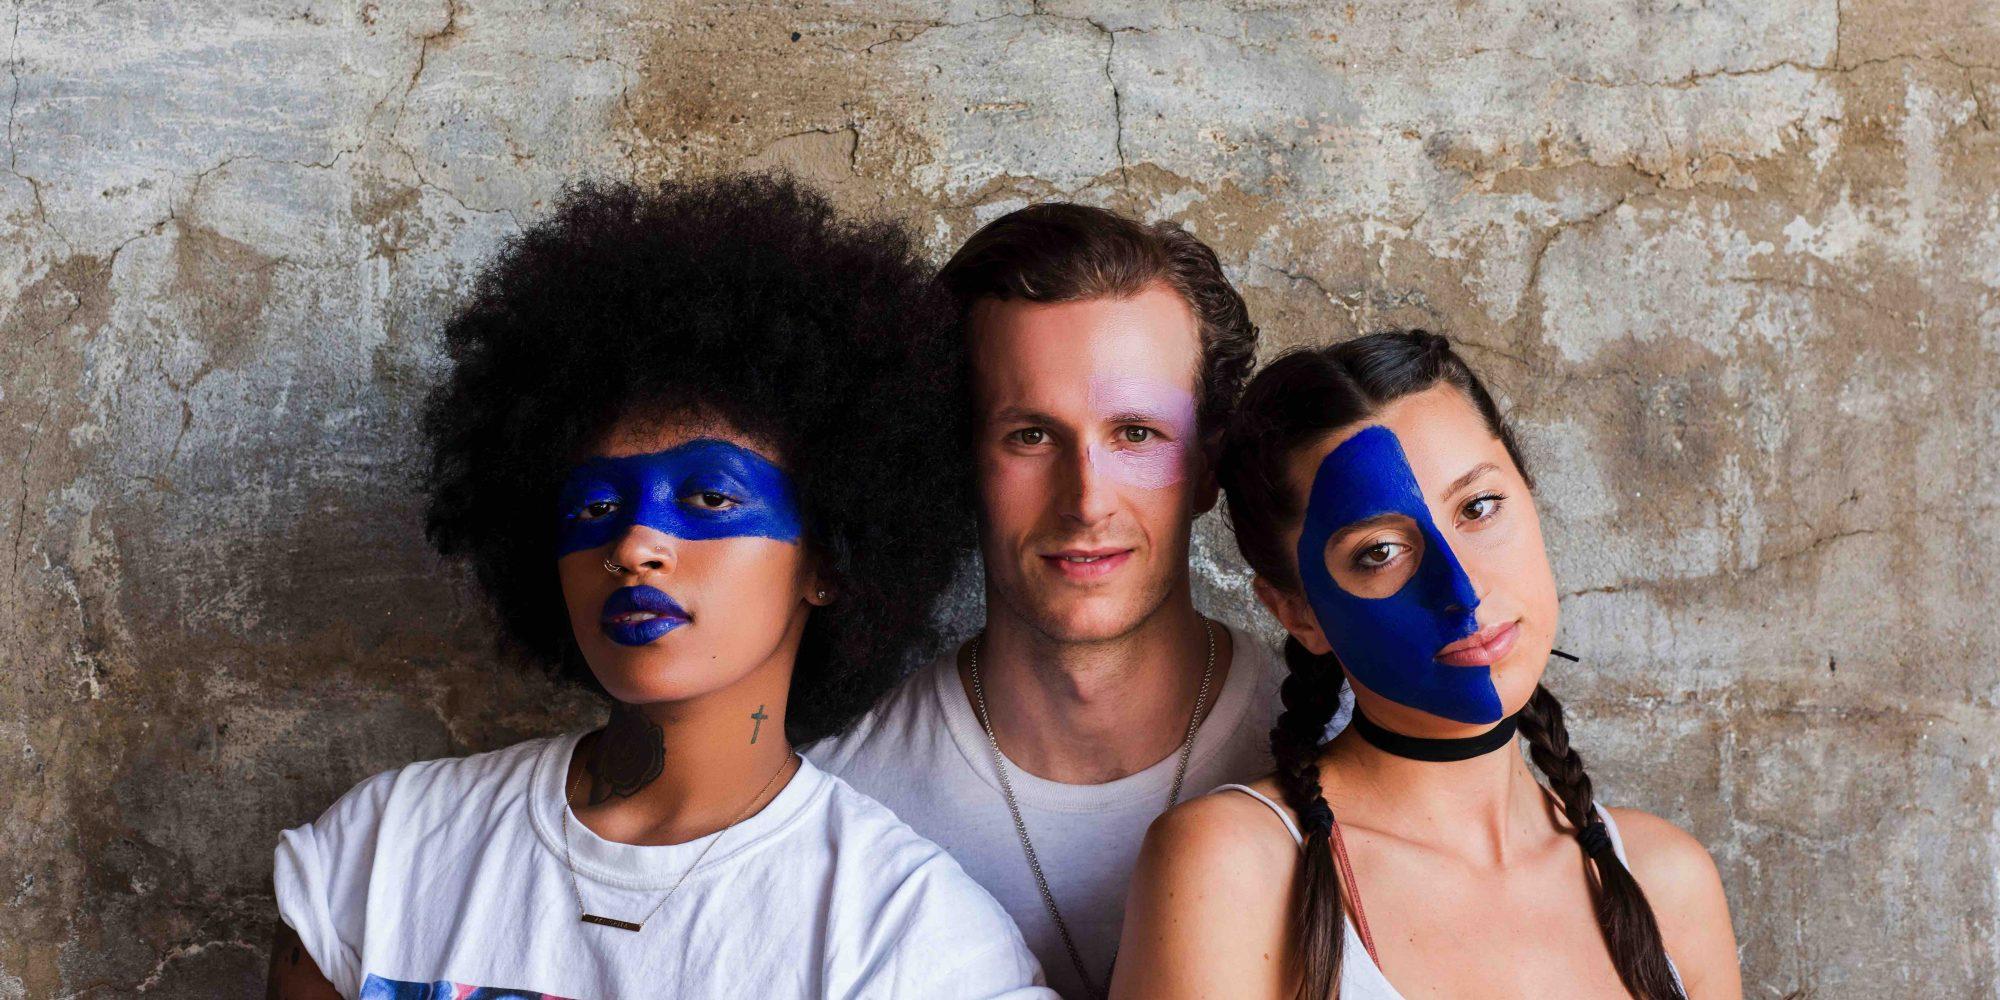 Street Art-Inspired Brand Graffiti Collective Transforms Skincare Into Creative Self-Expression